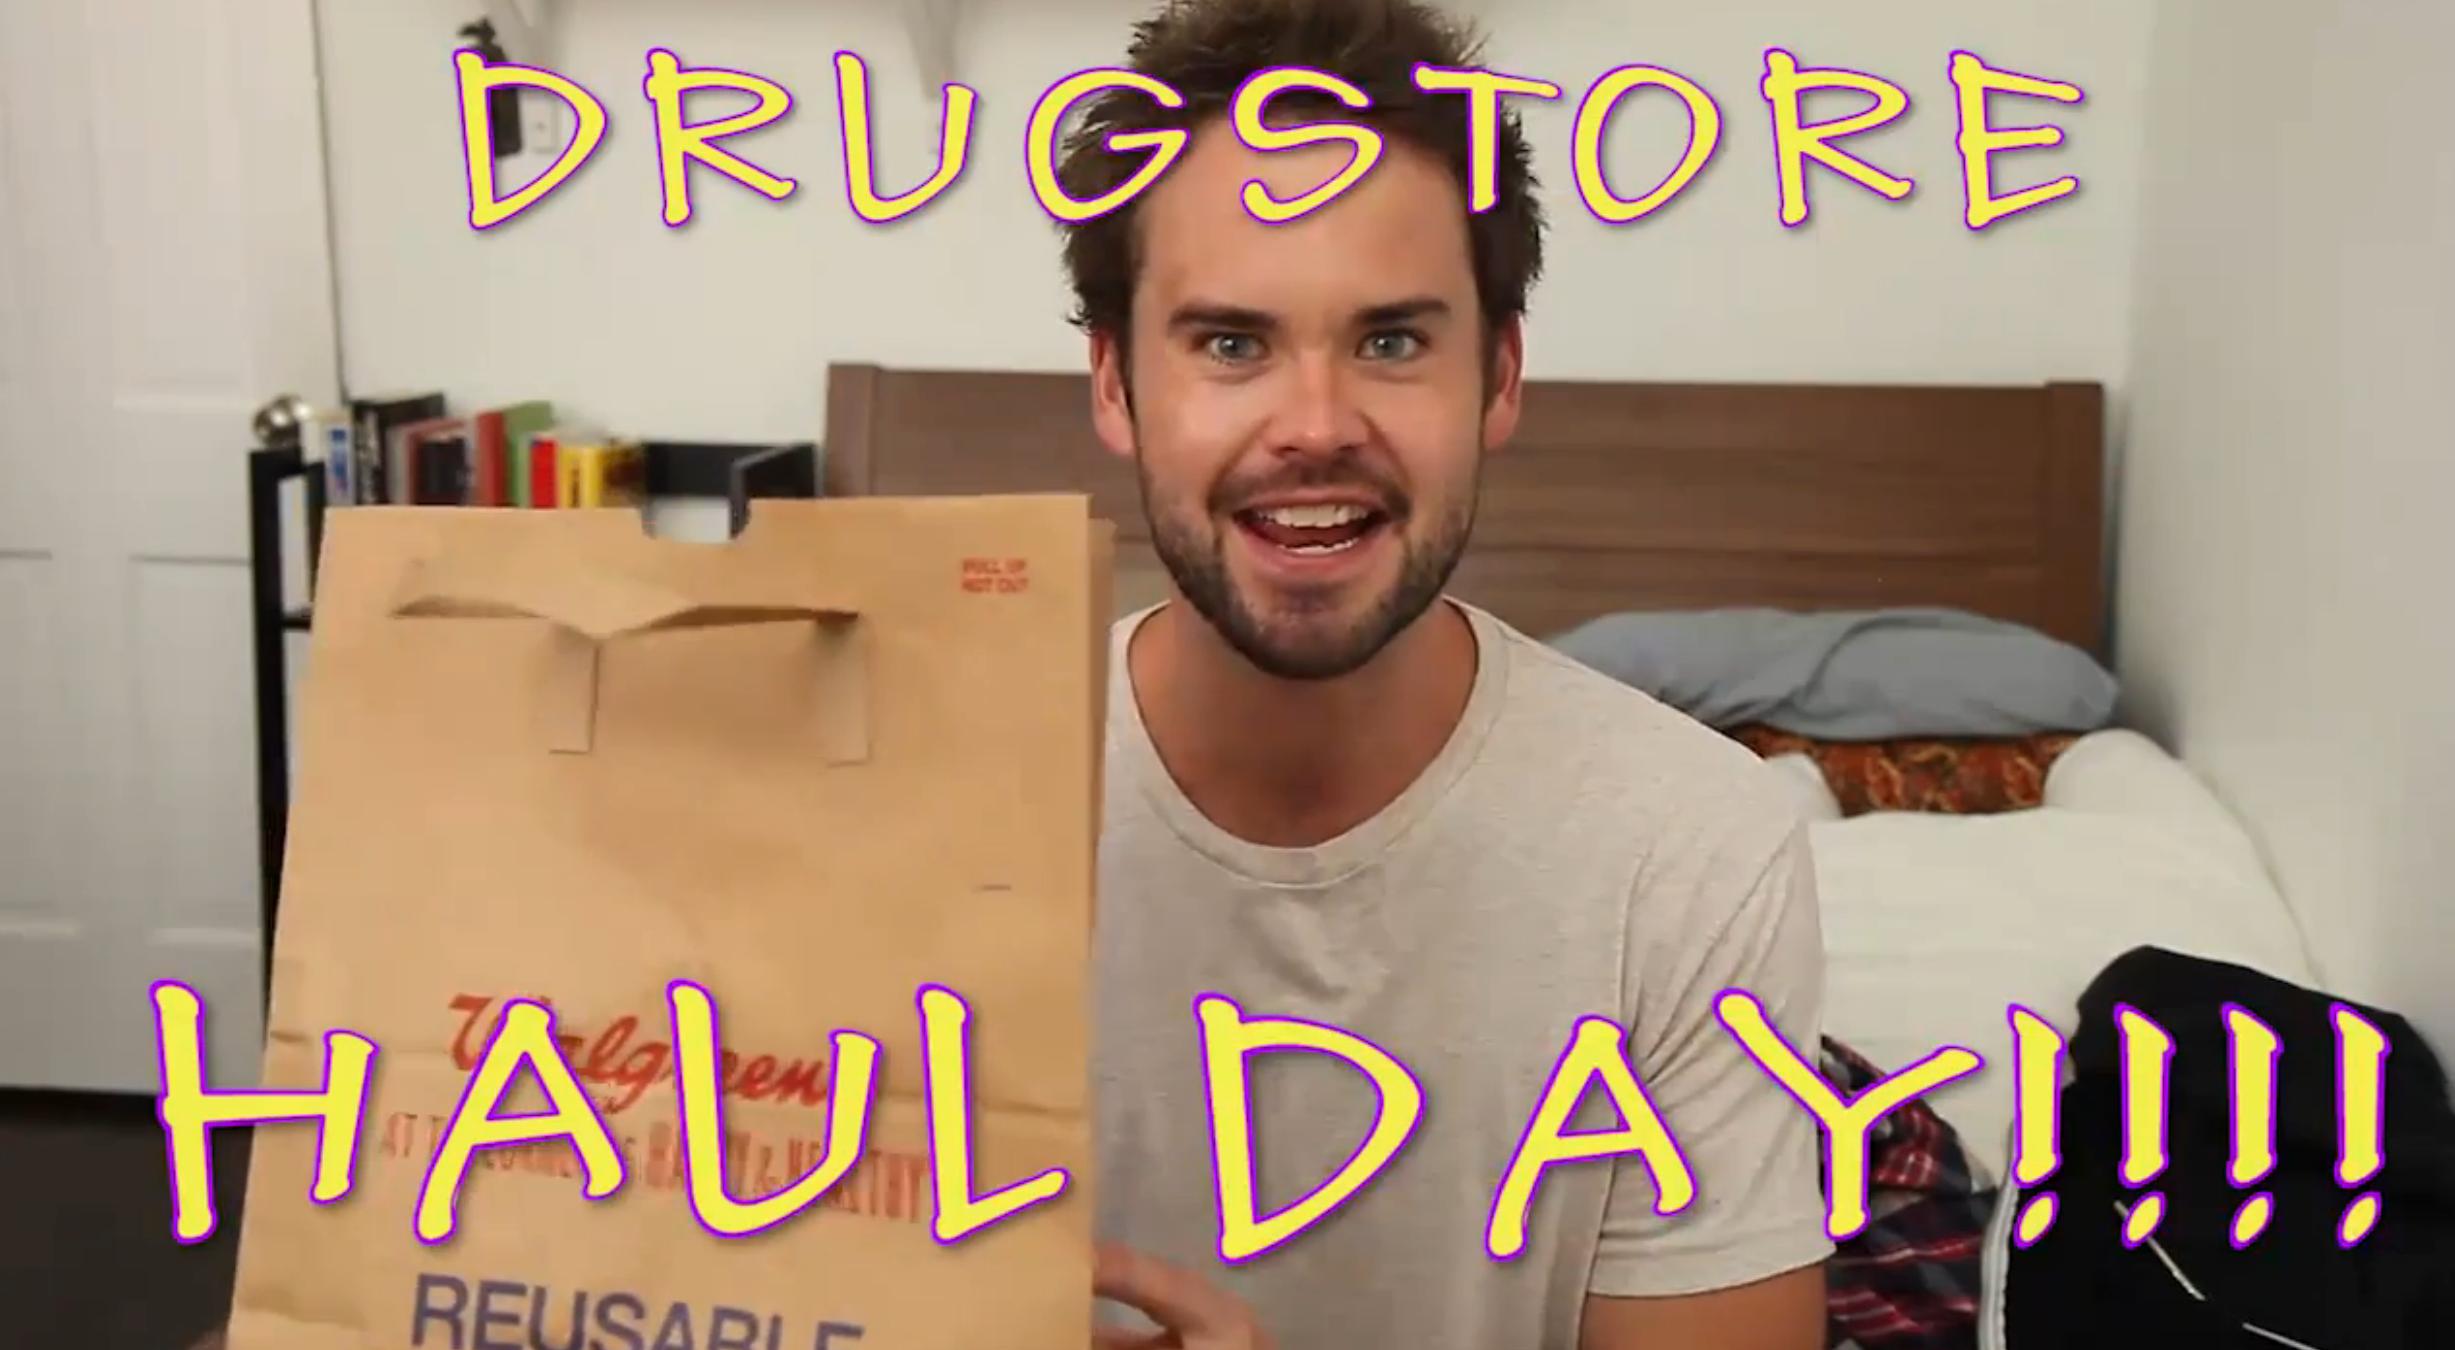 What if guys made girls' haul shopping videos?